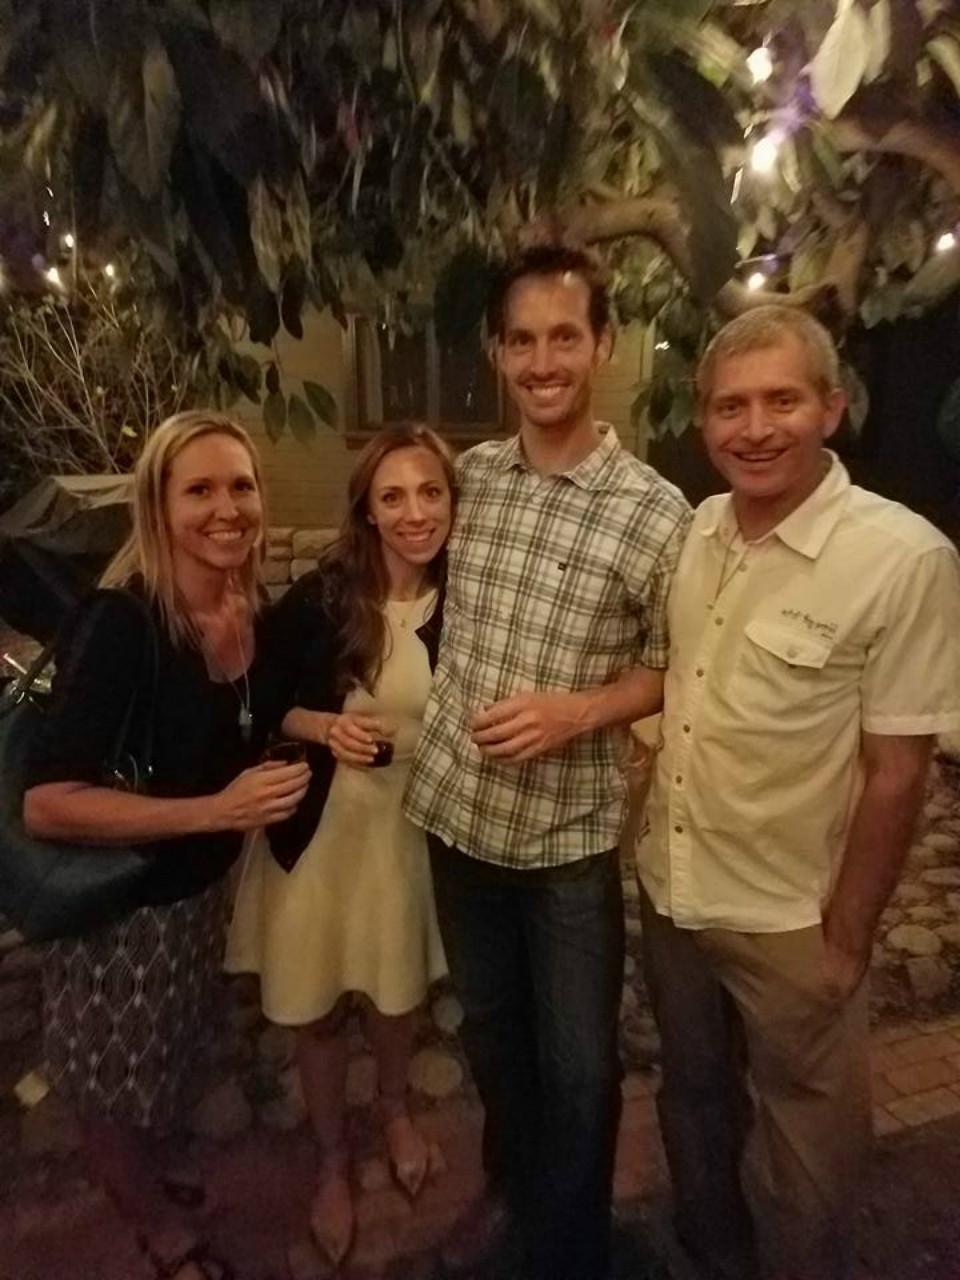 Tara and Rob Sivulka with Elizabeth and Matt Vessey